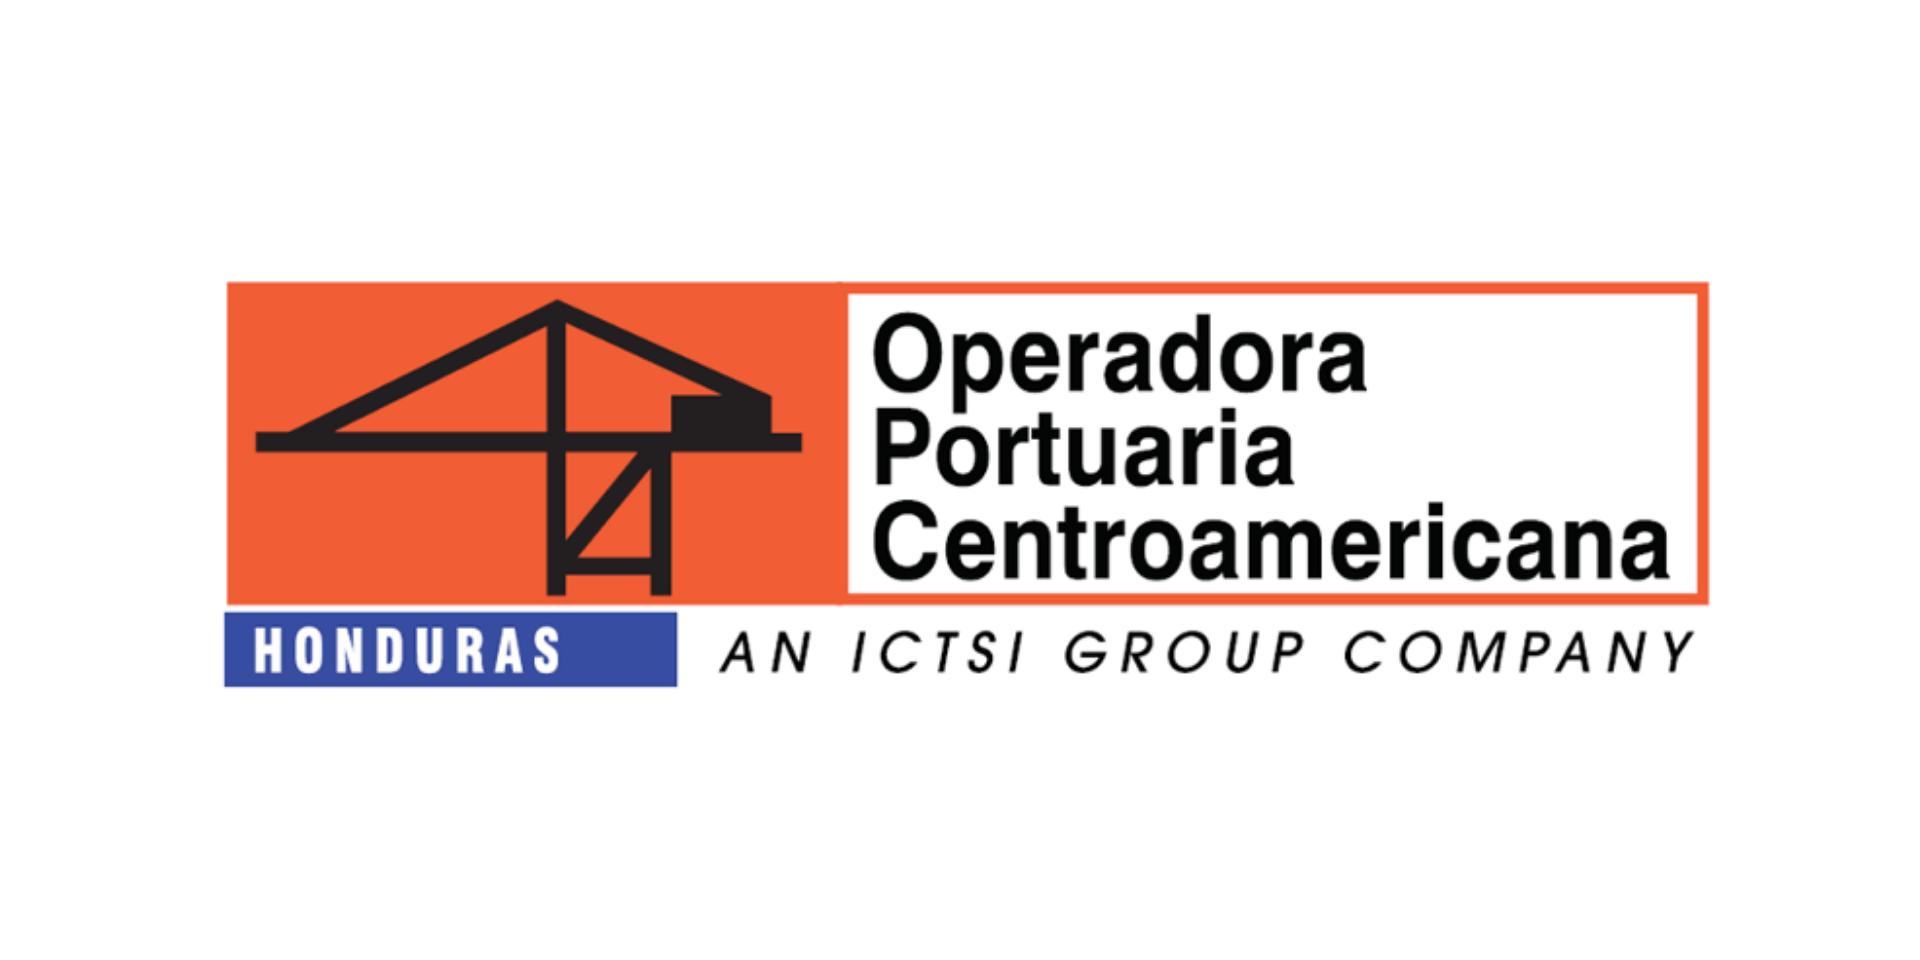 OPC – Operadora Portuaria Centroamericana